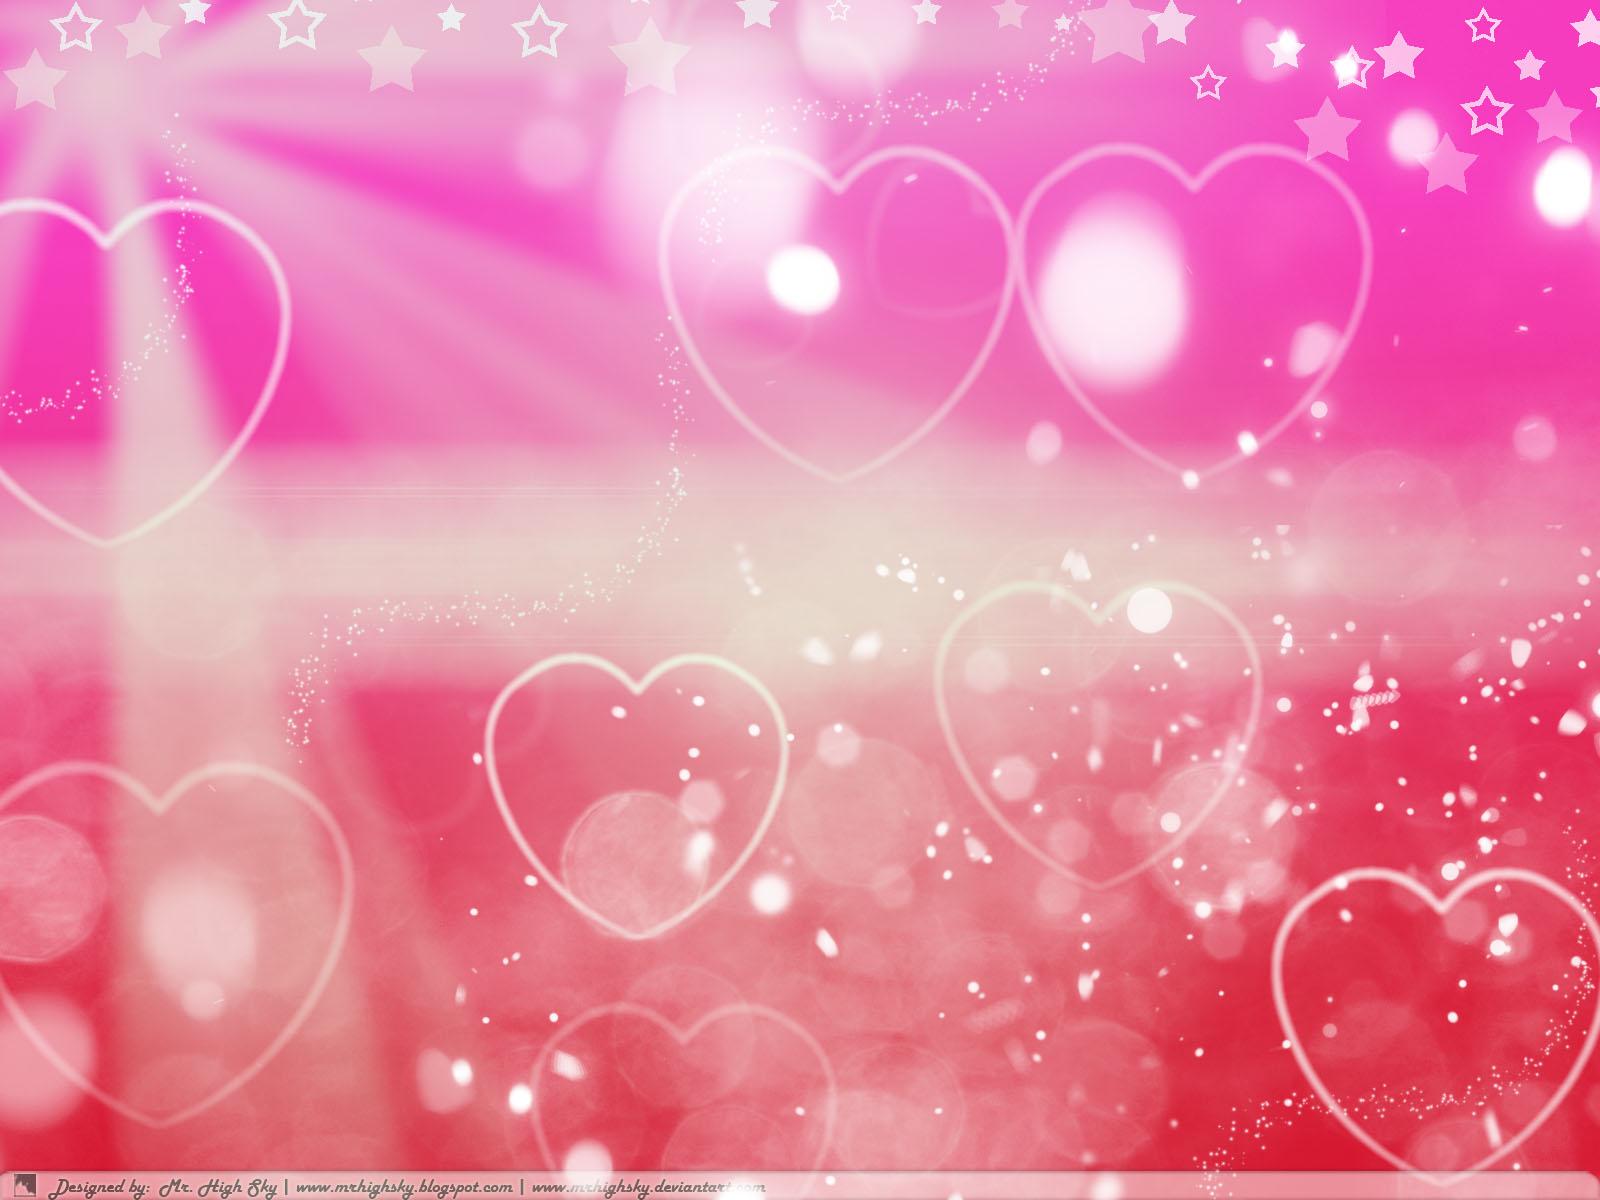 http://2.bp.blogspot.com/-hLhVMjCCTO8/Tob-VMVA_7I/AAAAAAAADMI/AJjkCJSovgc/s1600/Love-Vector-Wallpapers-.jpg